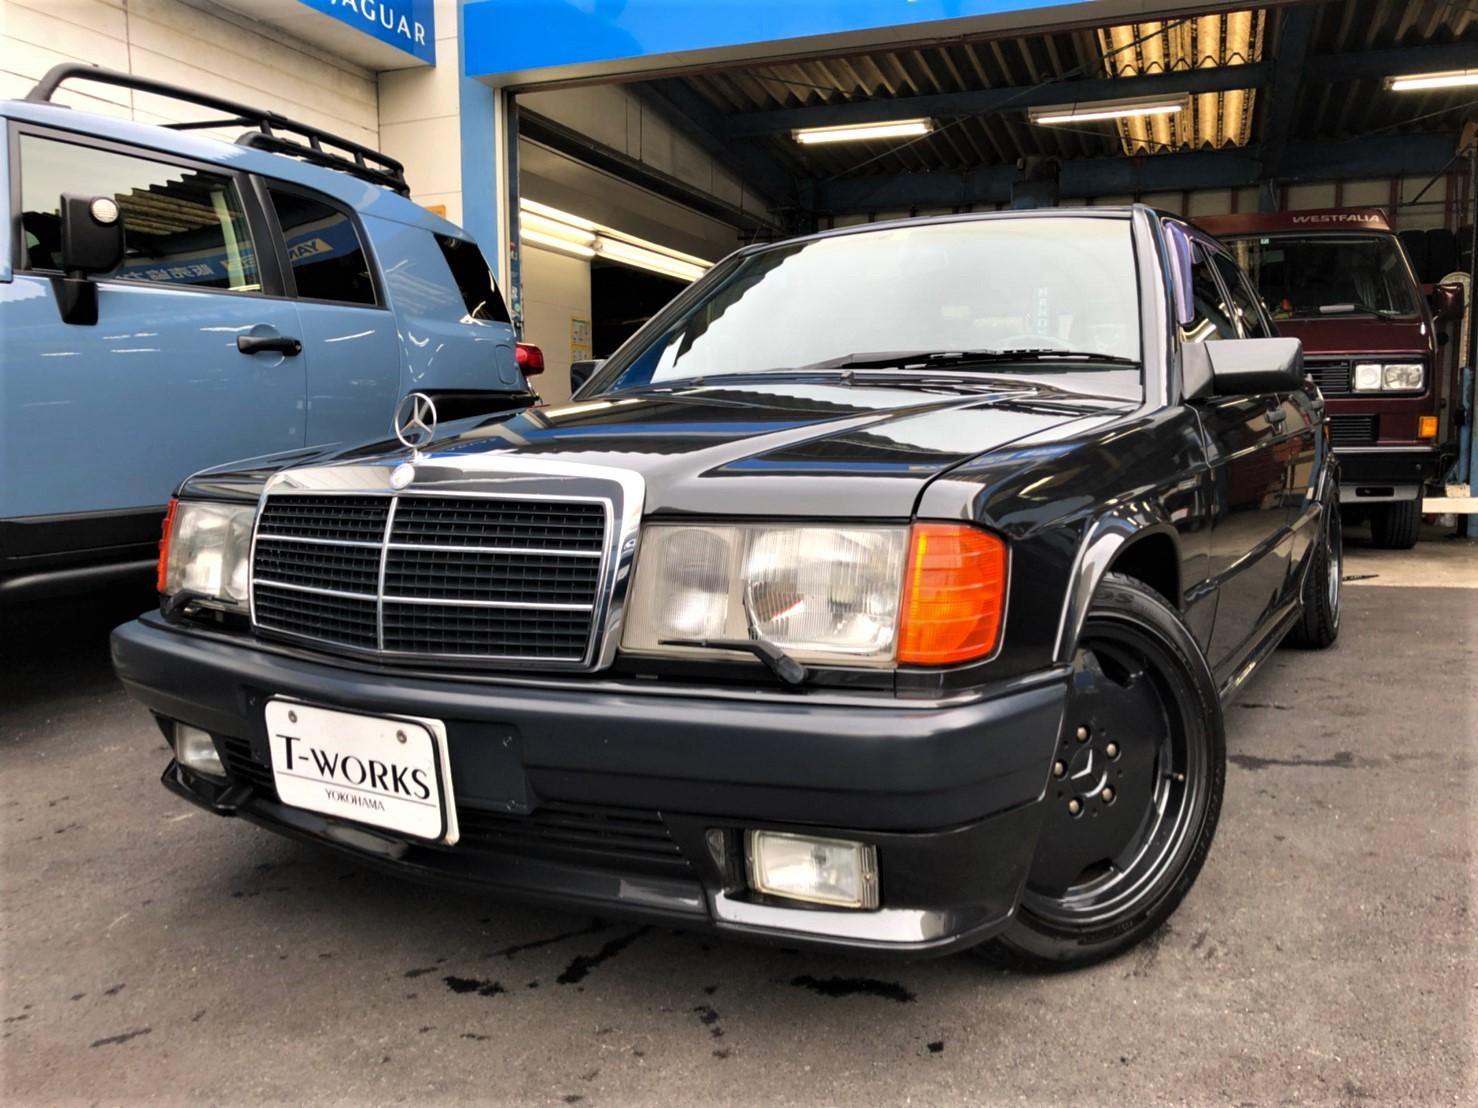 1992y M.BENZ 190E 2.5-16V